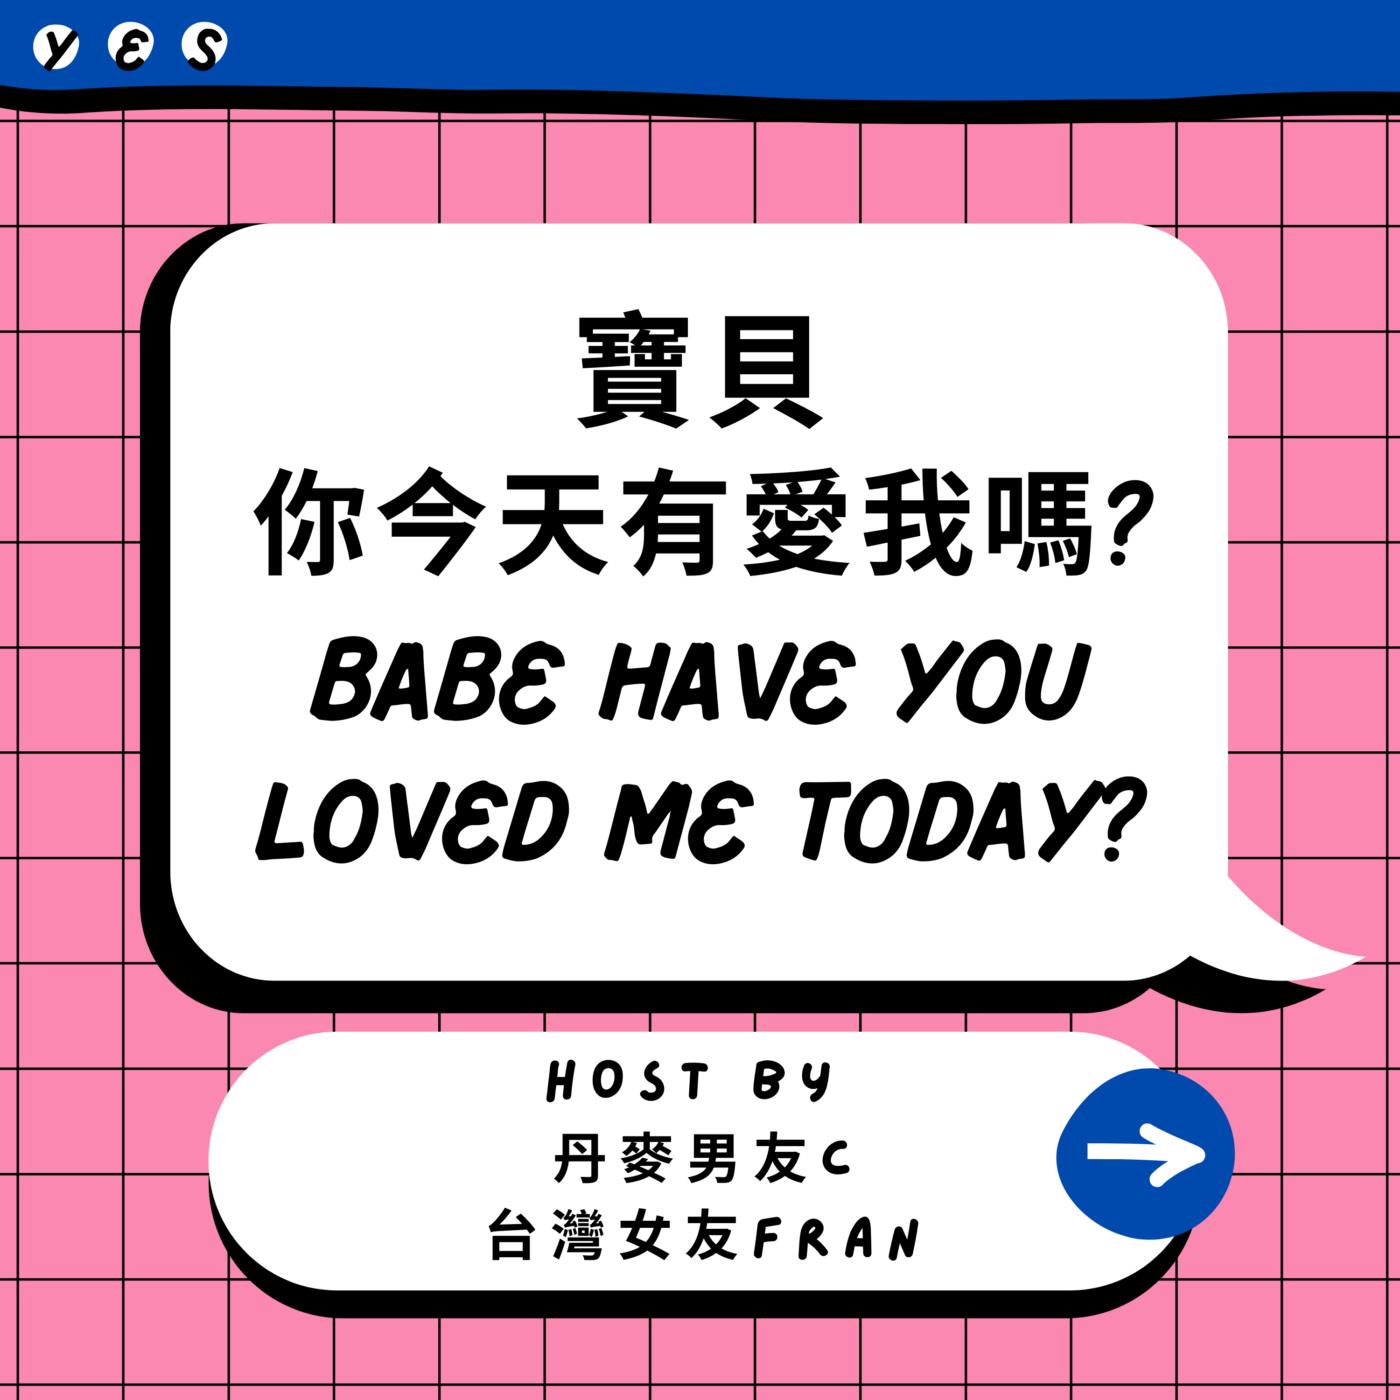 EP1 |用交友軟體丹麥台灣想法大不同,但我們至少遇見了彼此